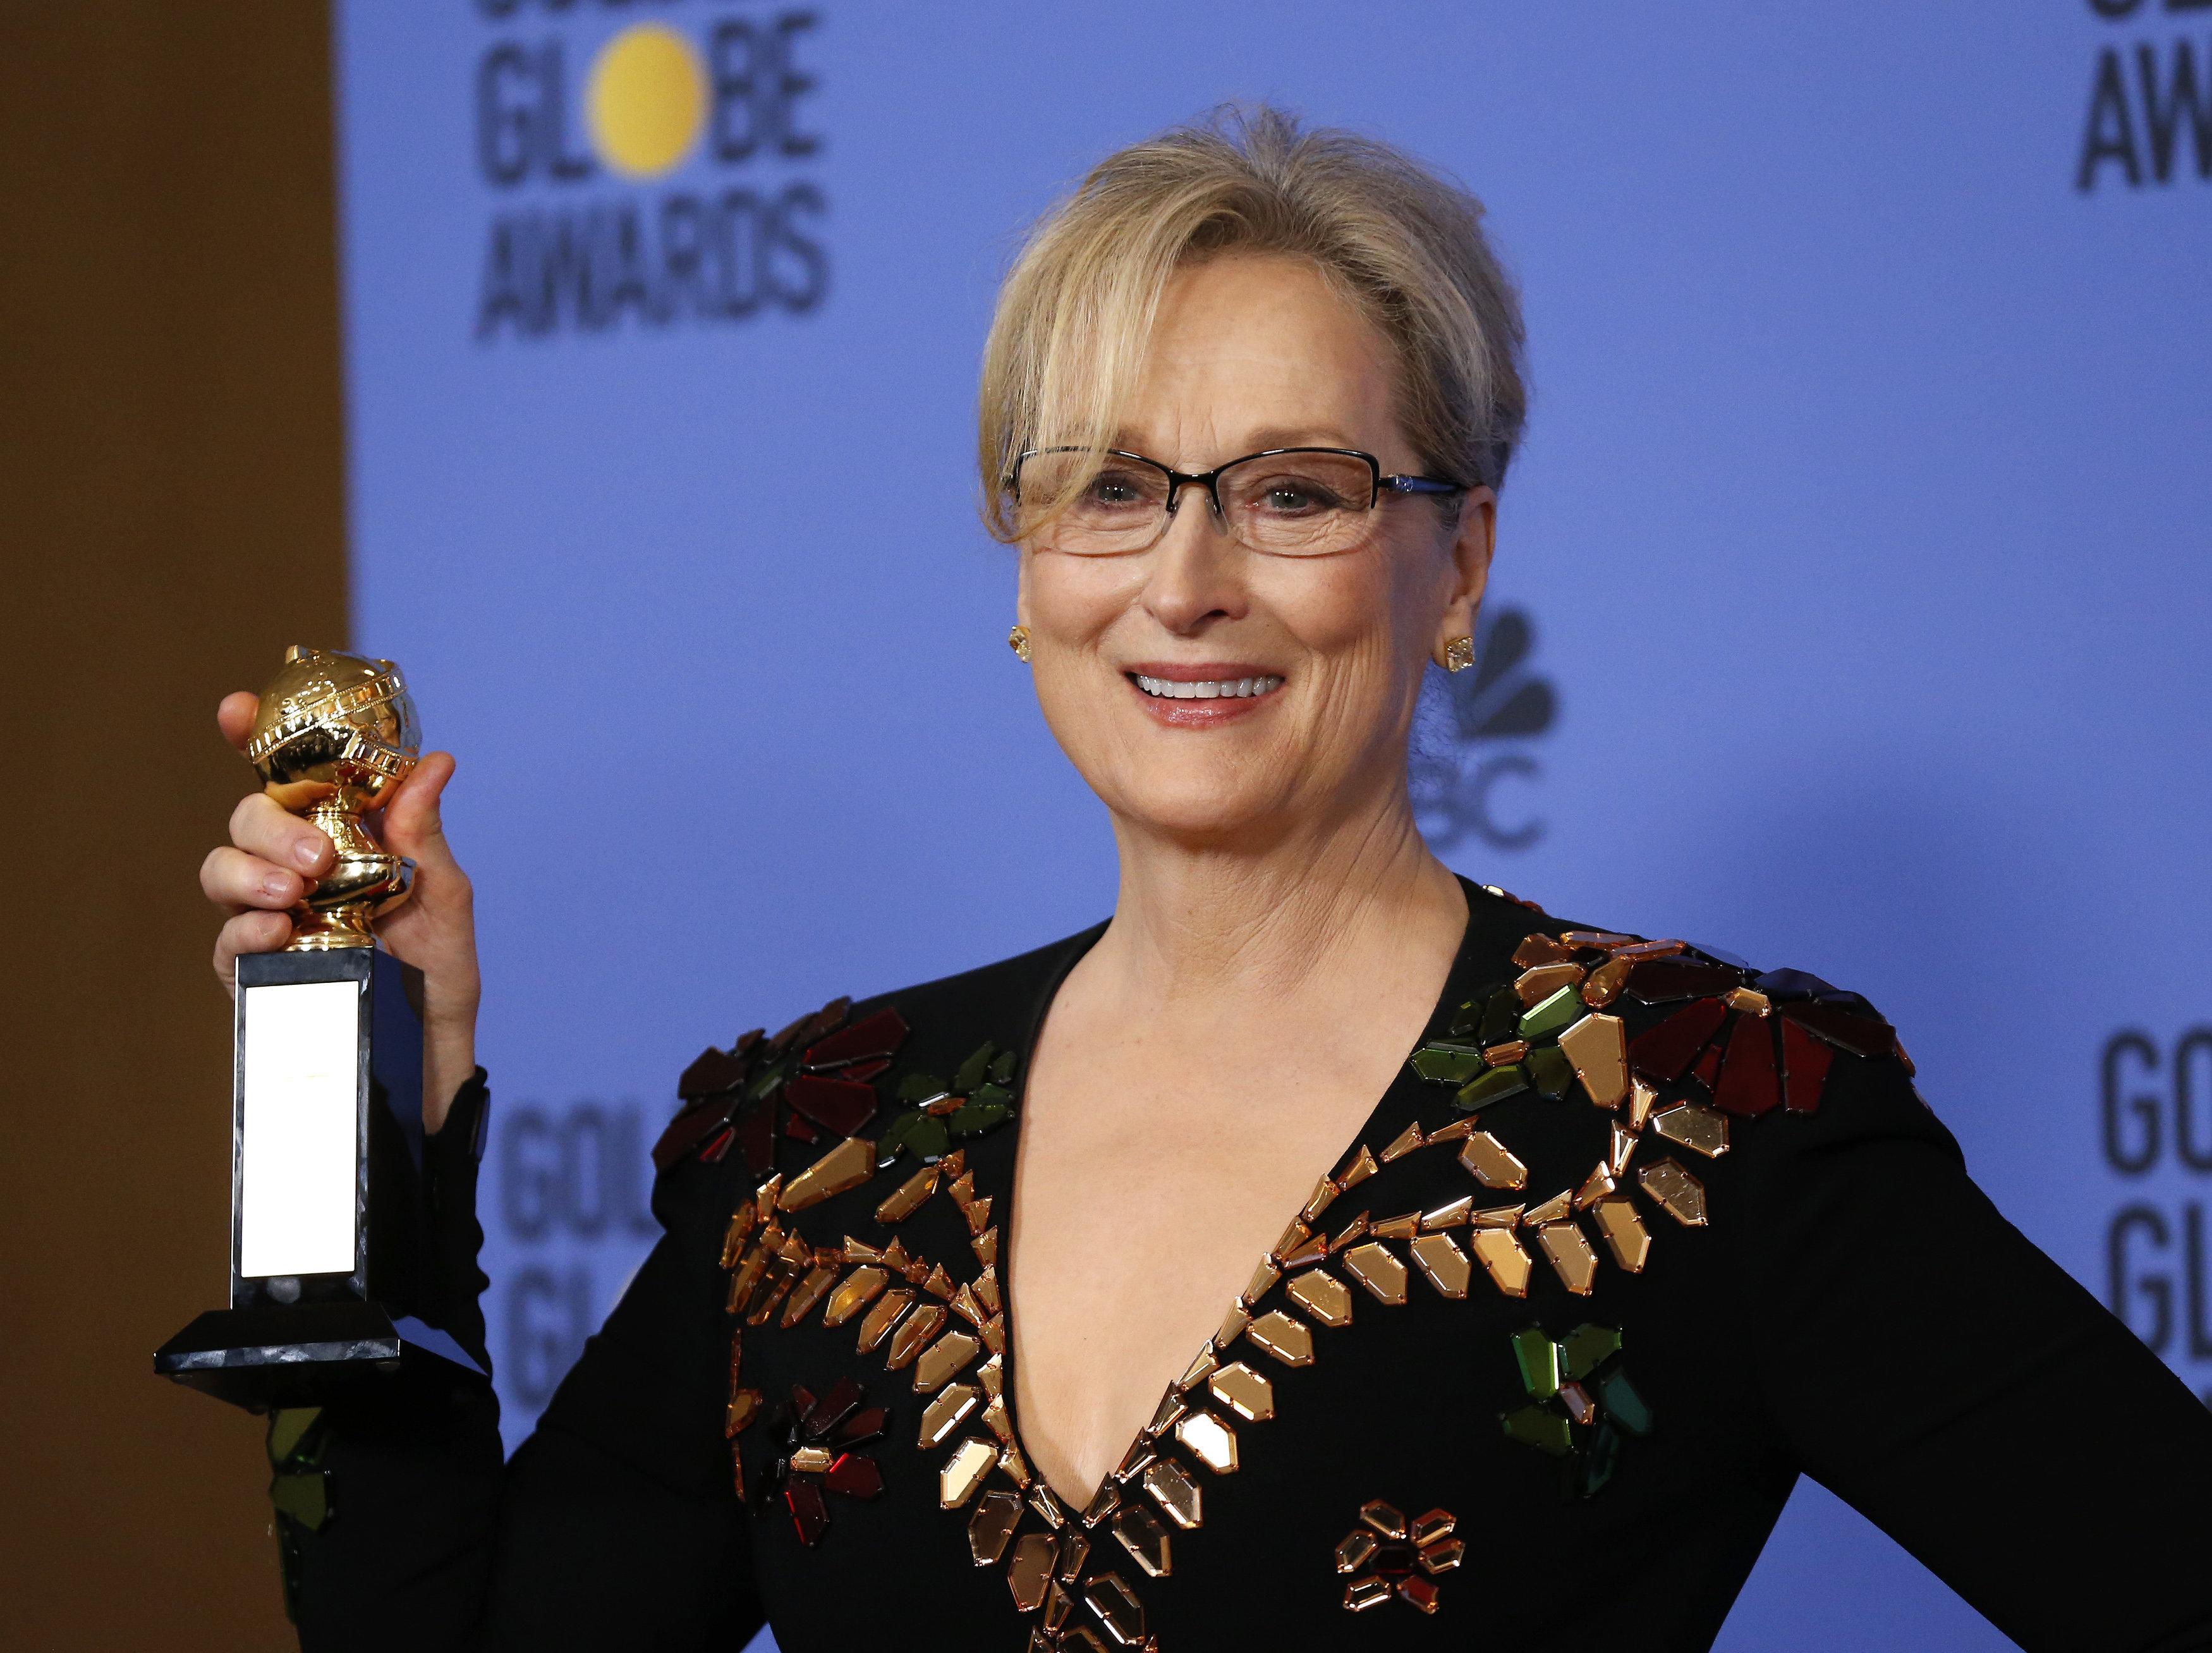 Exclusive: Meryl Streep Responds To Rose McGowan's